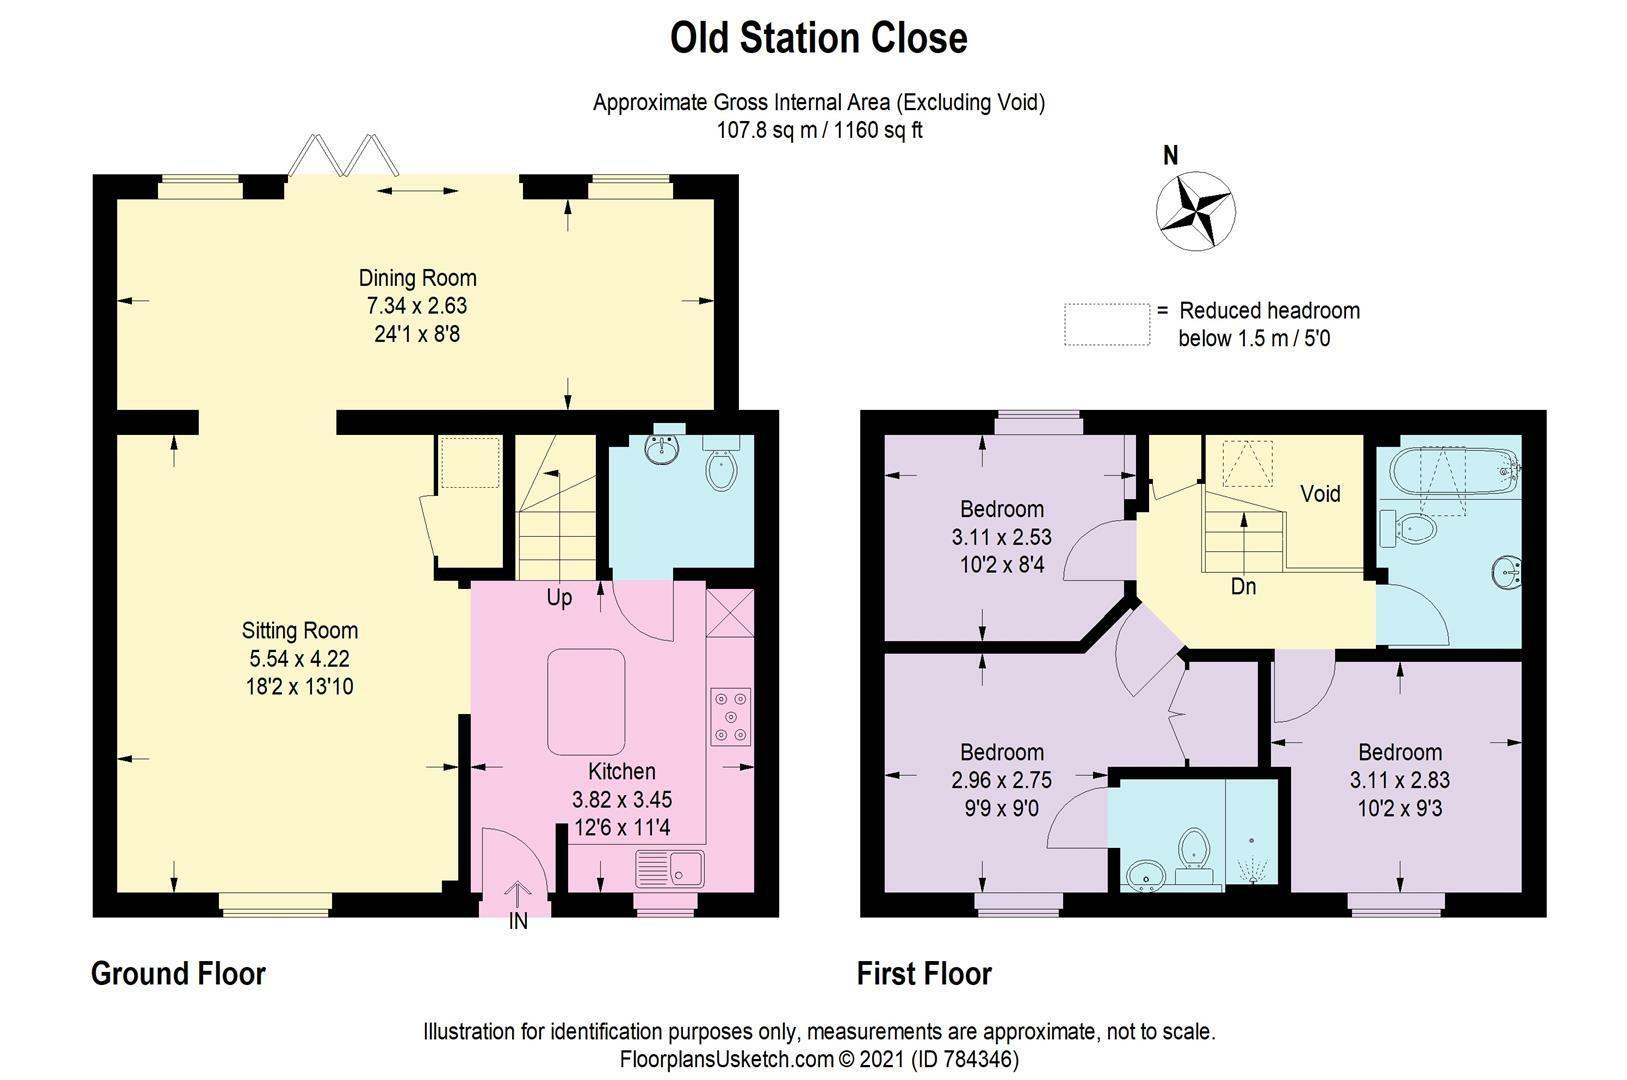 14 Old Station Close - Brochure